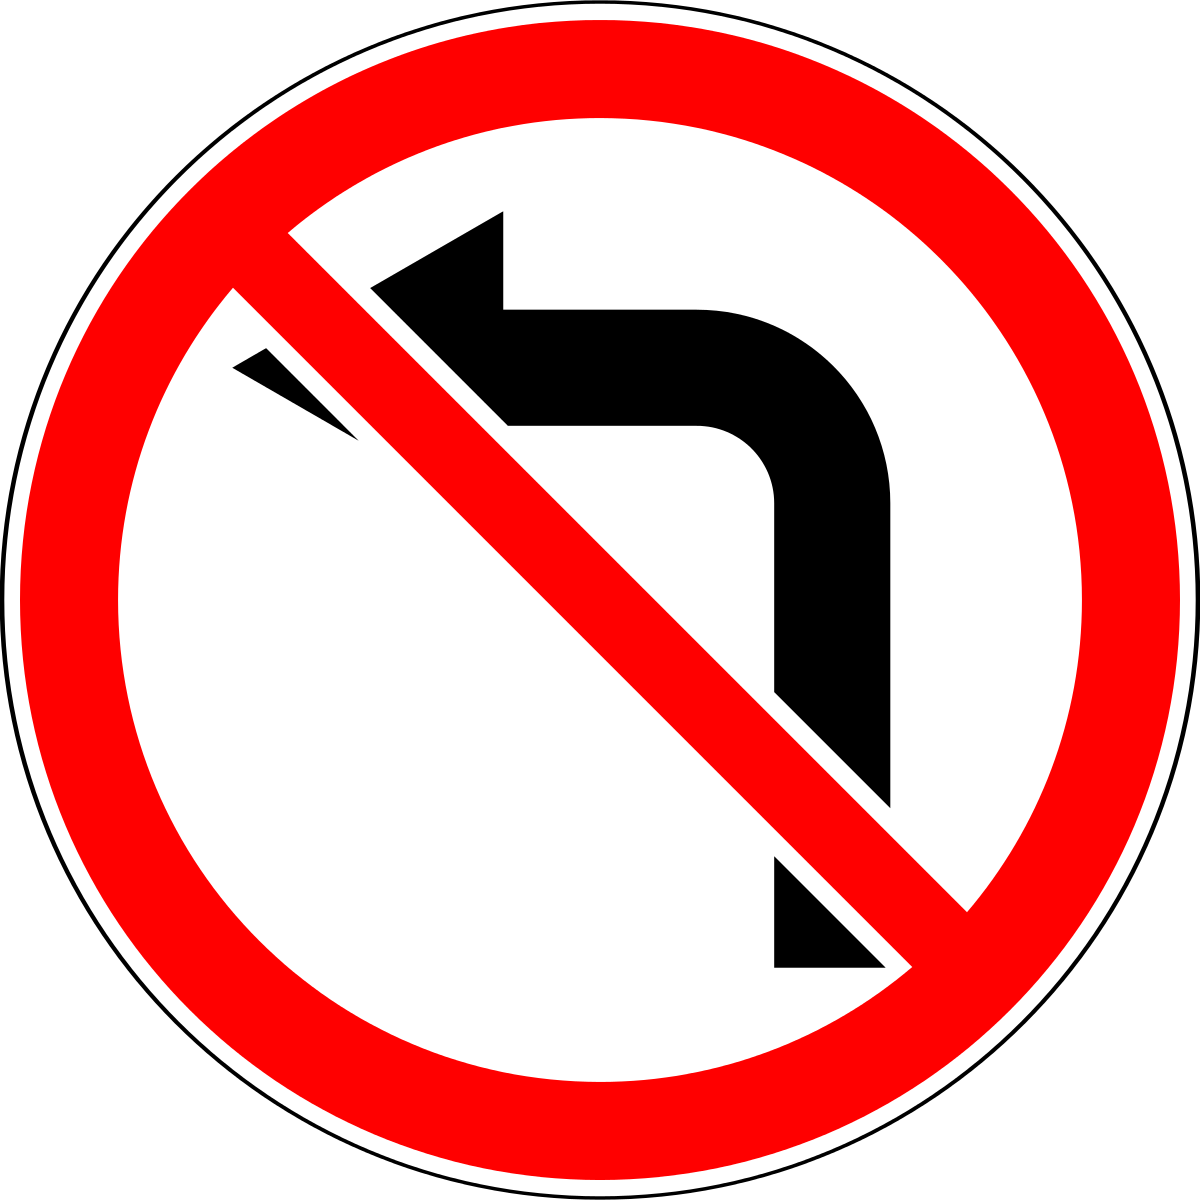 Знак 3.18.2 Солға бұрылуга тыйым салынады/ Поворот налево запрещен